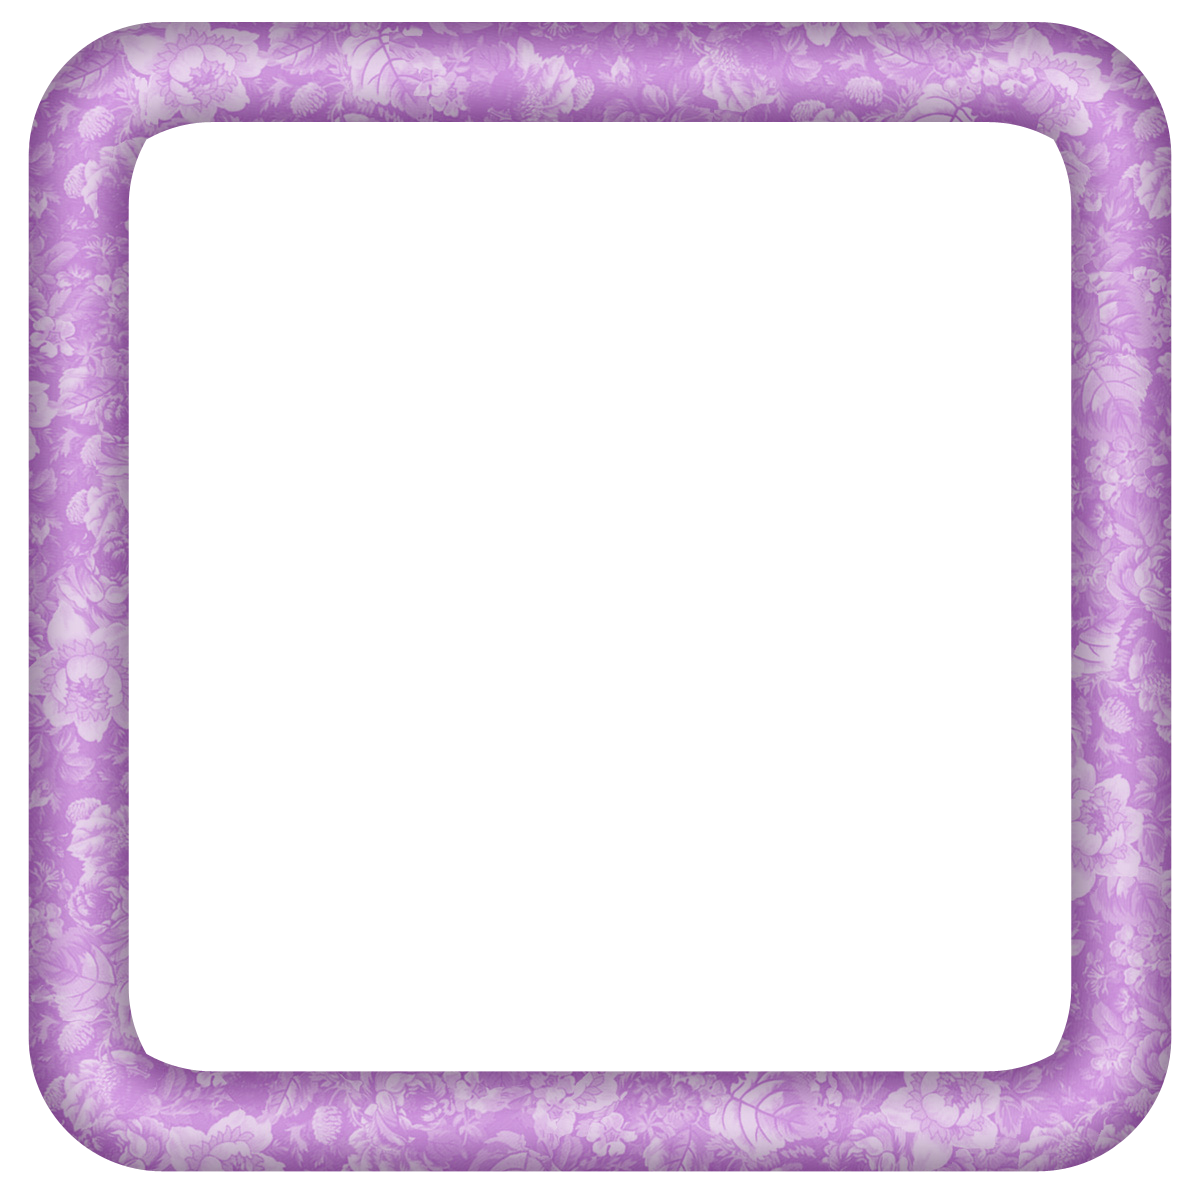 GRANNY ENCHANTED'S BLOG: Free Purple Love Digi Scrapbook Kit